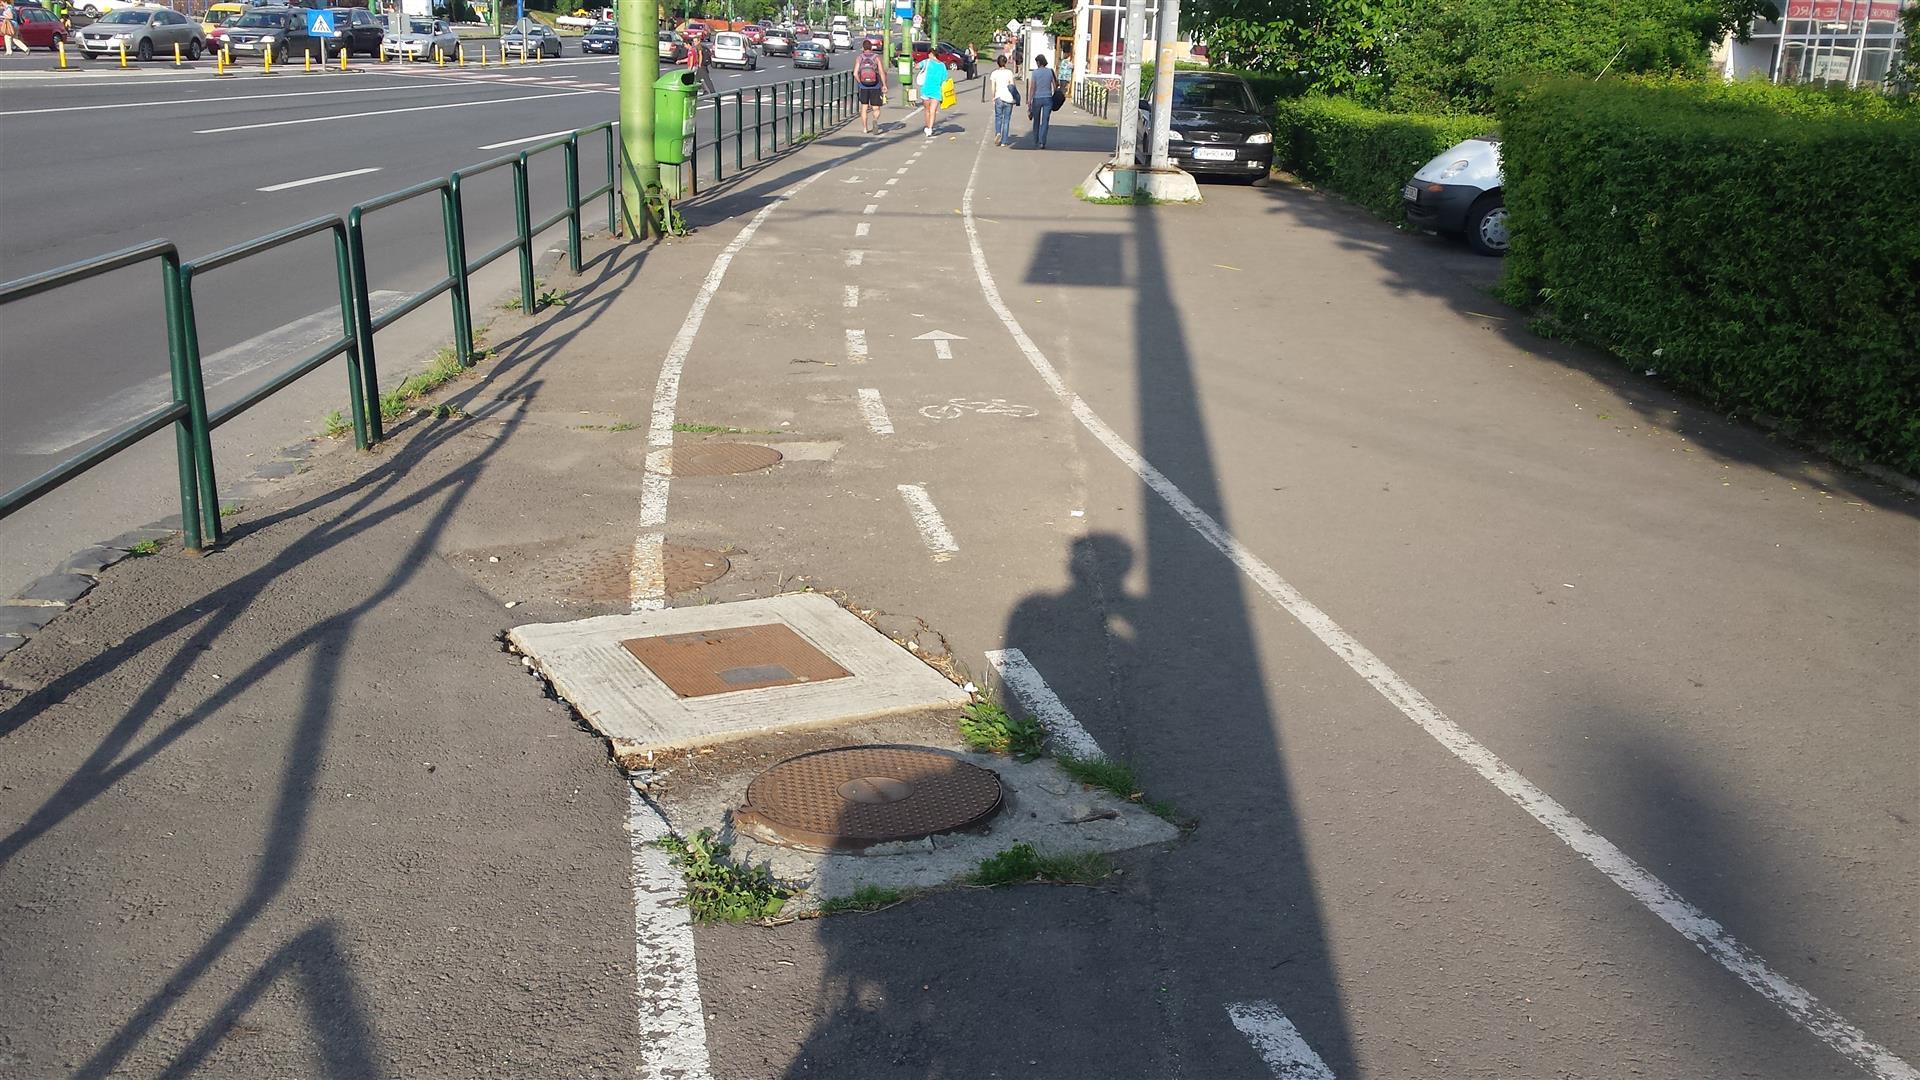 piste-biciclete-brasov-iunie-2015 (1) (Large)